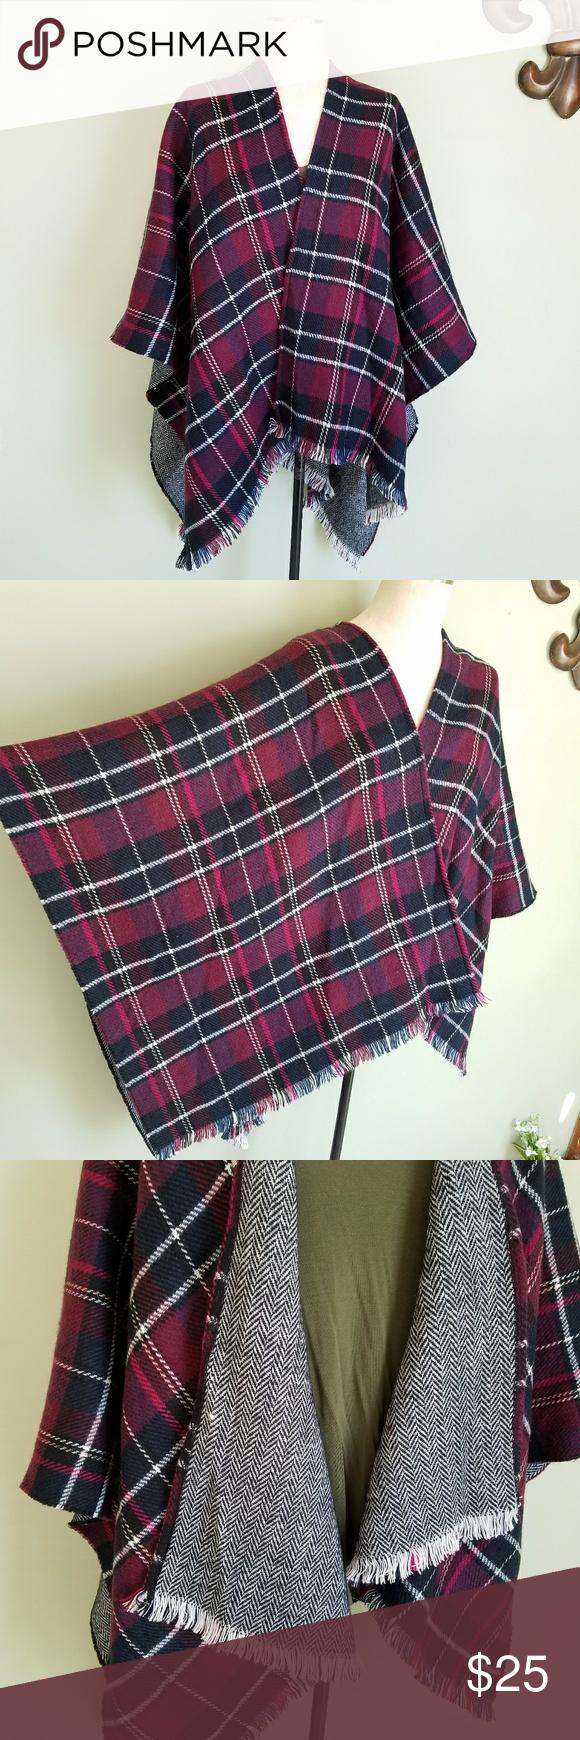 Flannel cardigan womens  Saks Fifth Avenue Flannel Plaid Poncho Cape